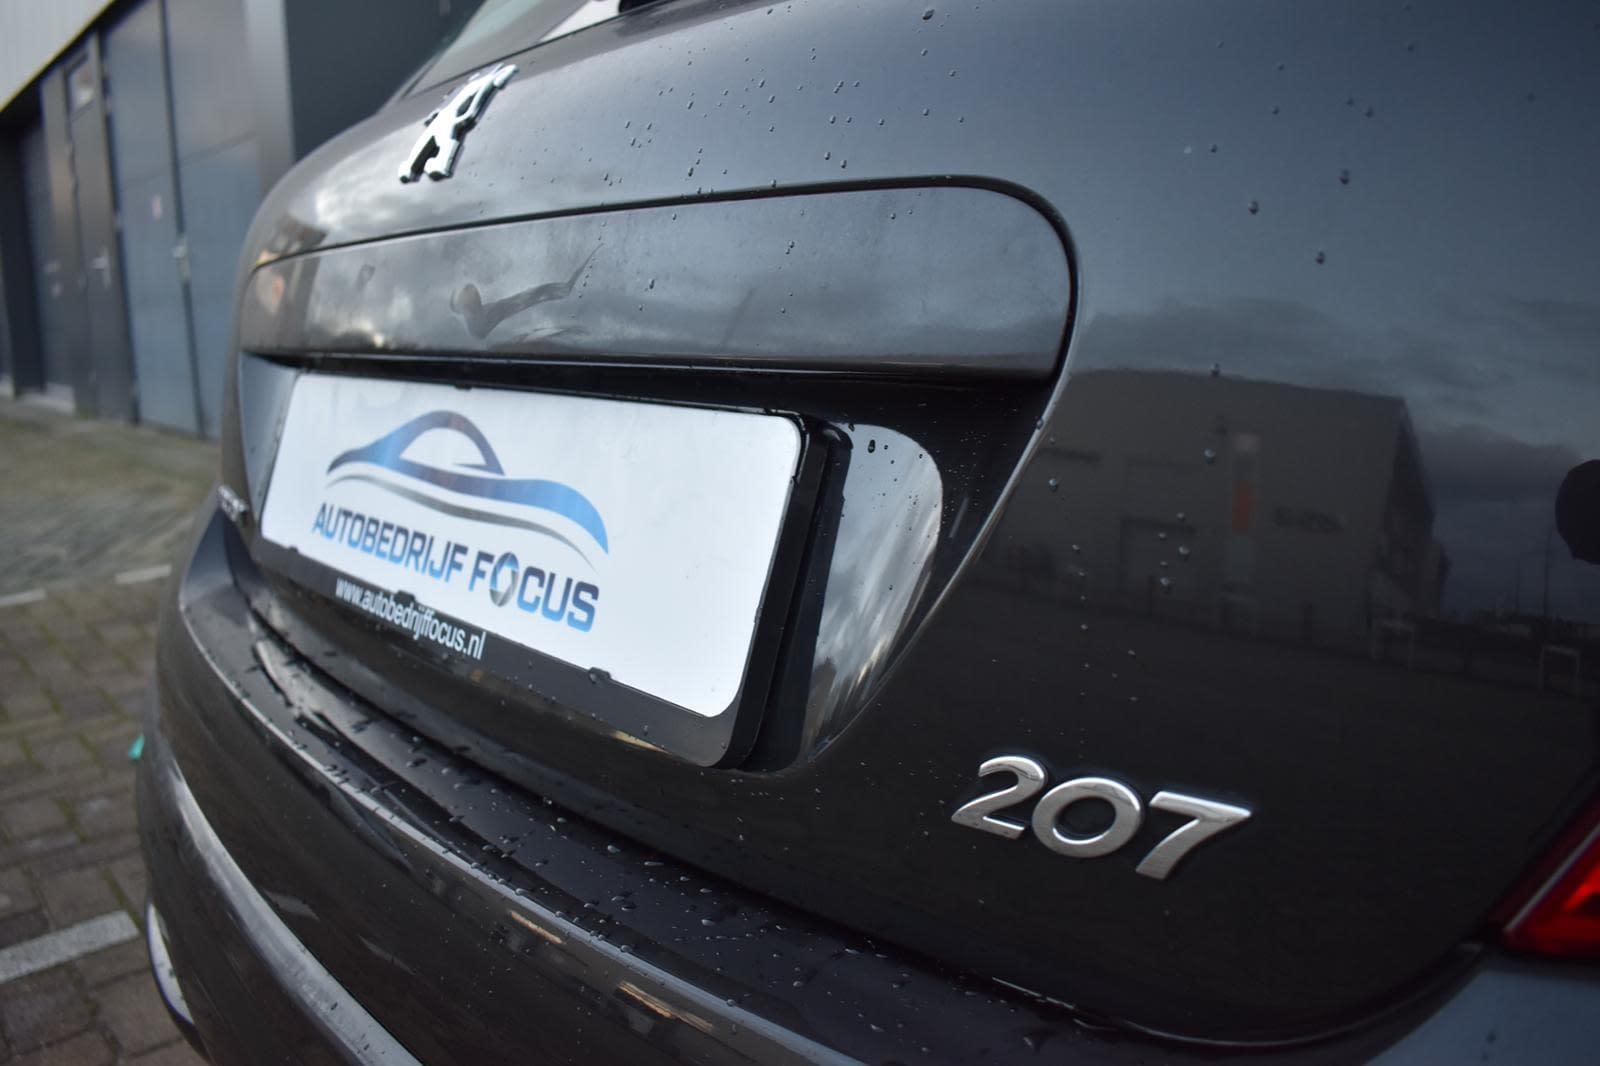 Peugeot 207 Blue Lease Executive 1.6 HDi 92pk NAVI/PDC/CLIMA